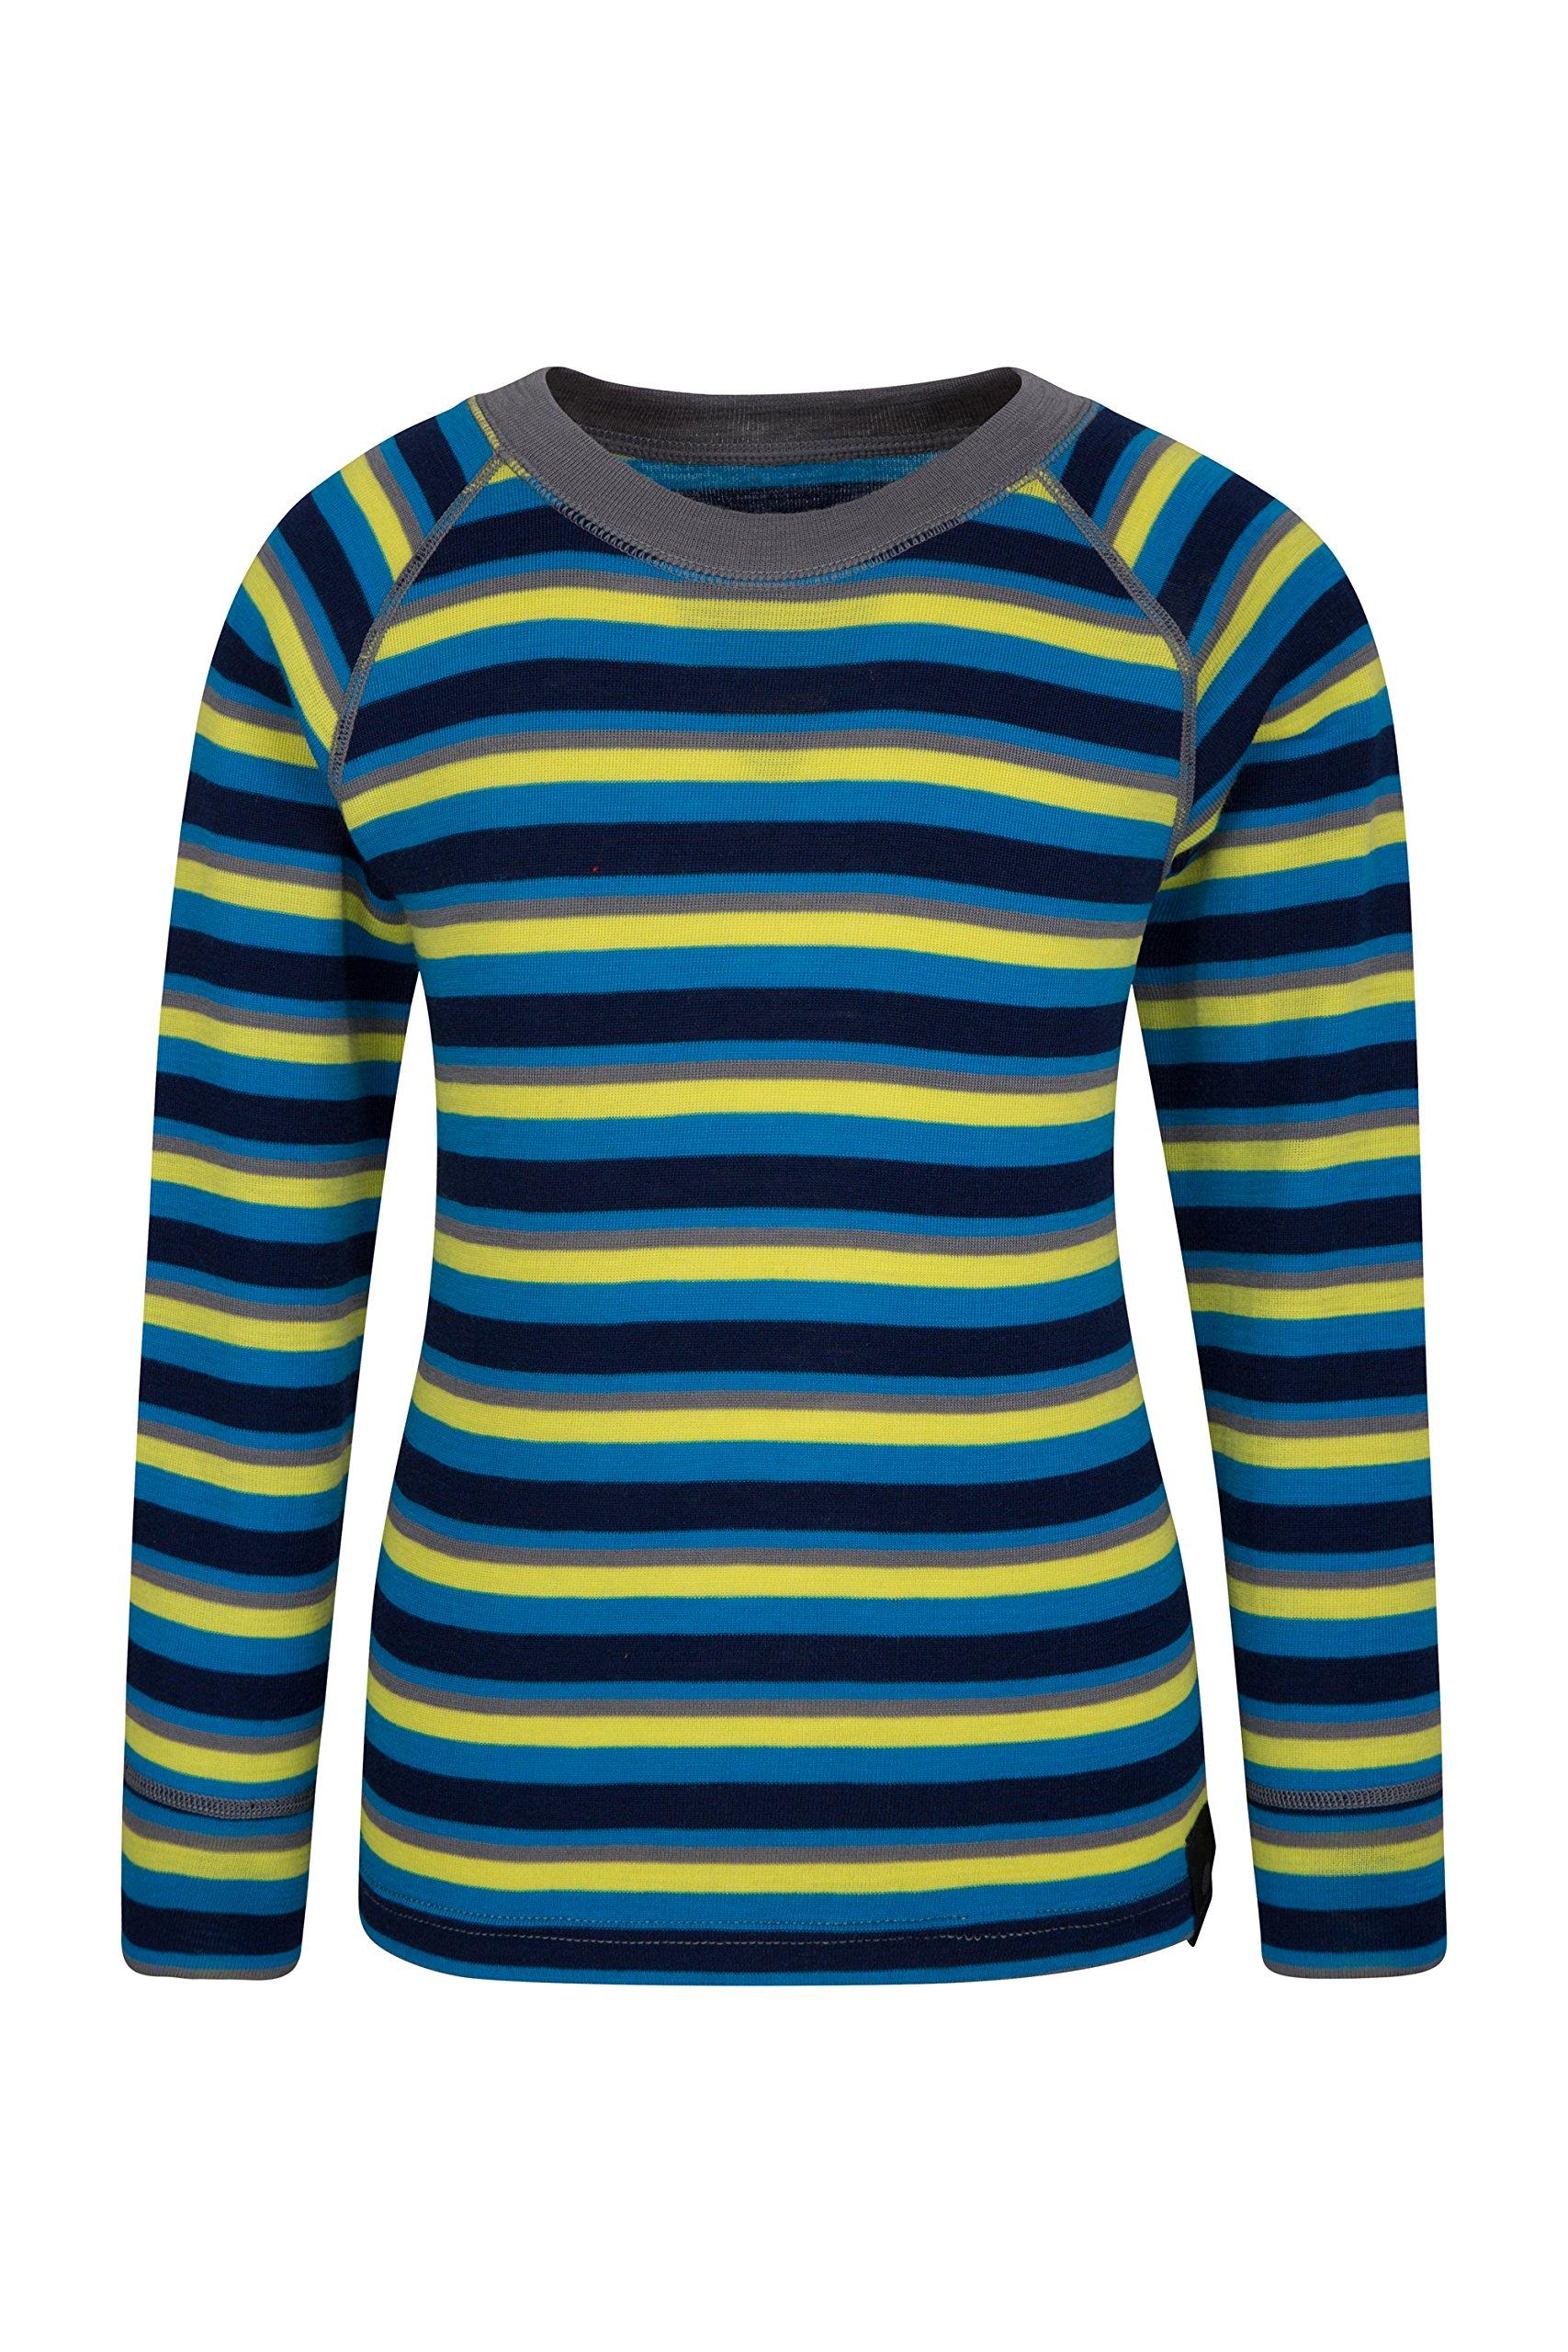 Mountain Warehouse Merino Kids Top- Breathable, Light Childrens Tshirt Blue 11-12 Years